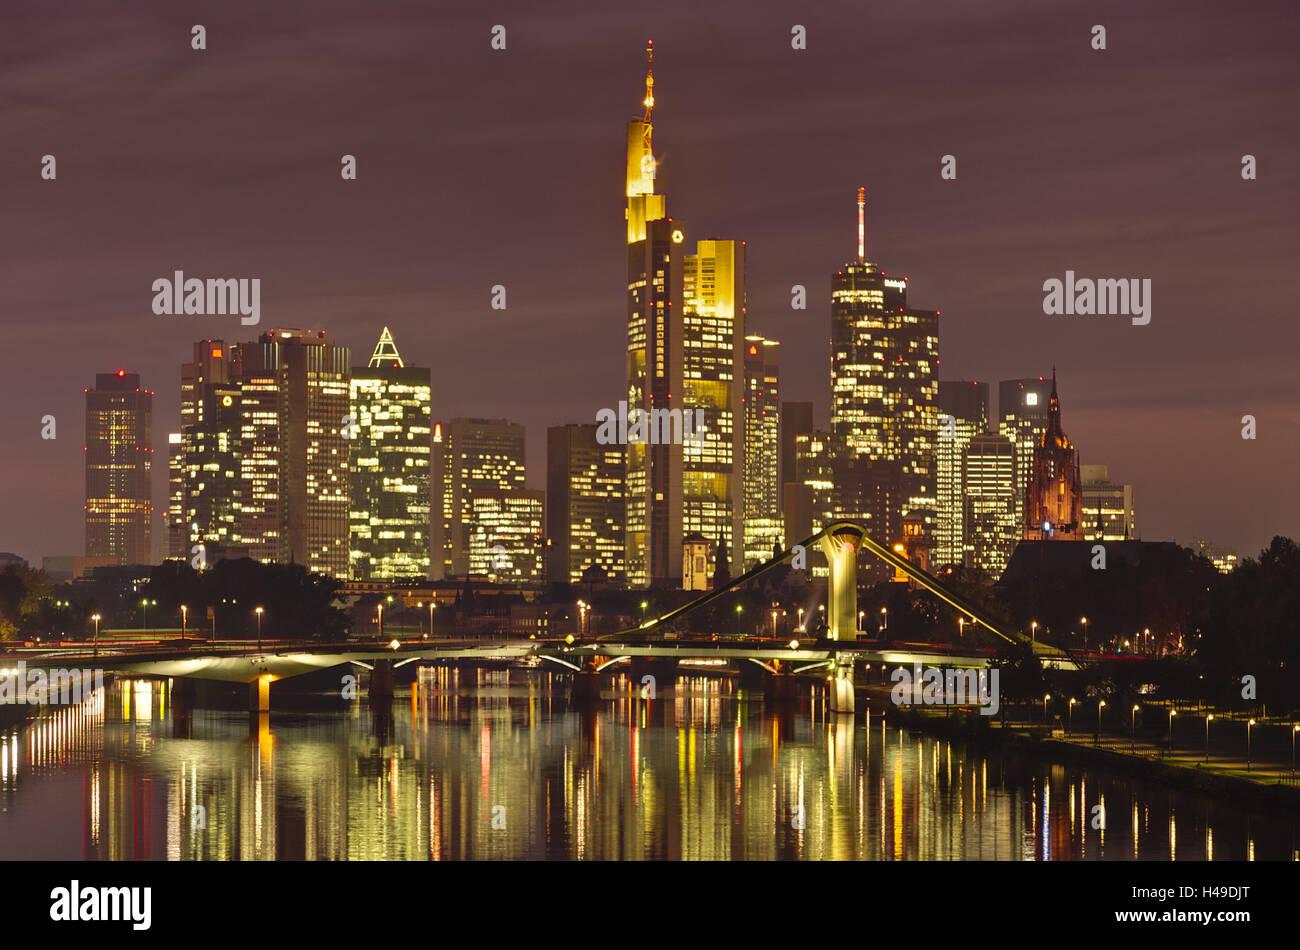 Germany, Hessen, Frankfurt, Main, Skyline, Evening, Dusk, Dawn, Architecture, Banking, Bank towers, lights, bridge, - Stock Image